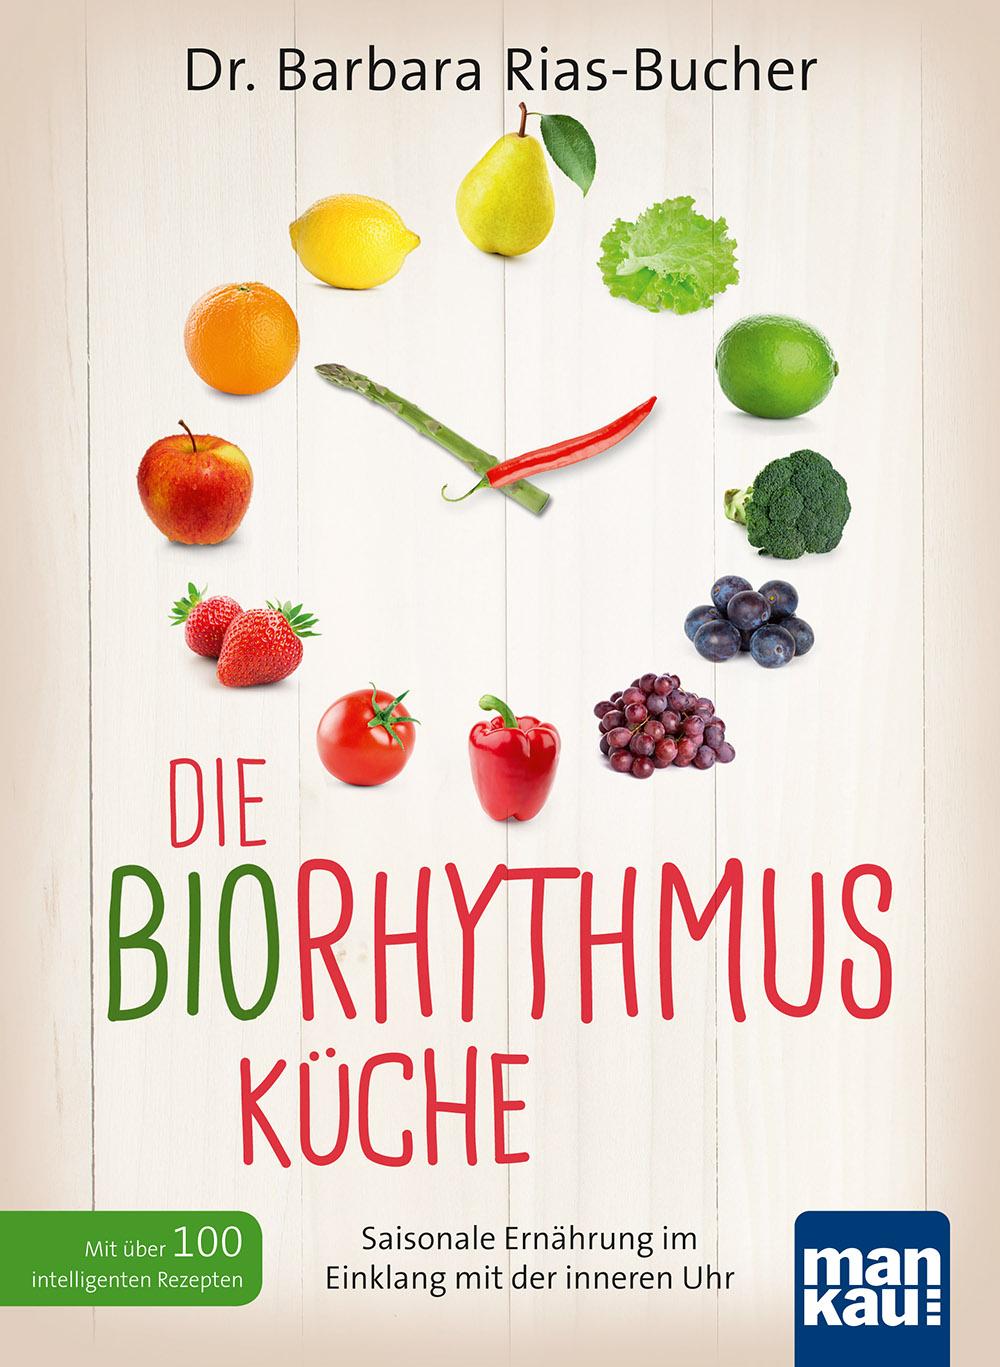 Medizin-Nobelpreis geht an Forschung zur inneren Uhr | Mankau Verlag